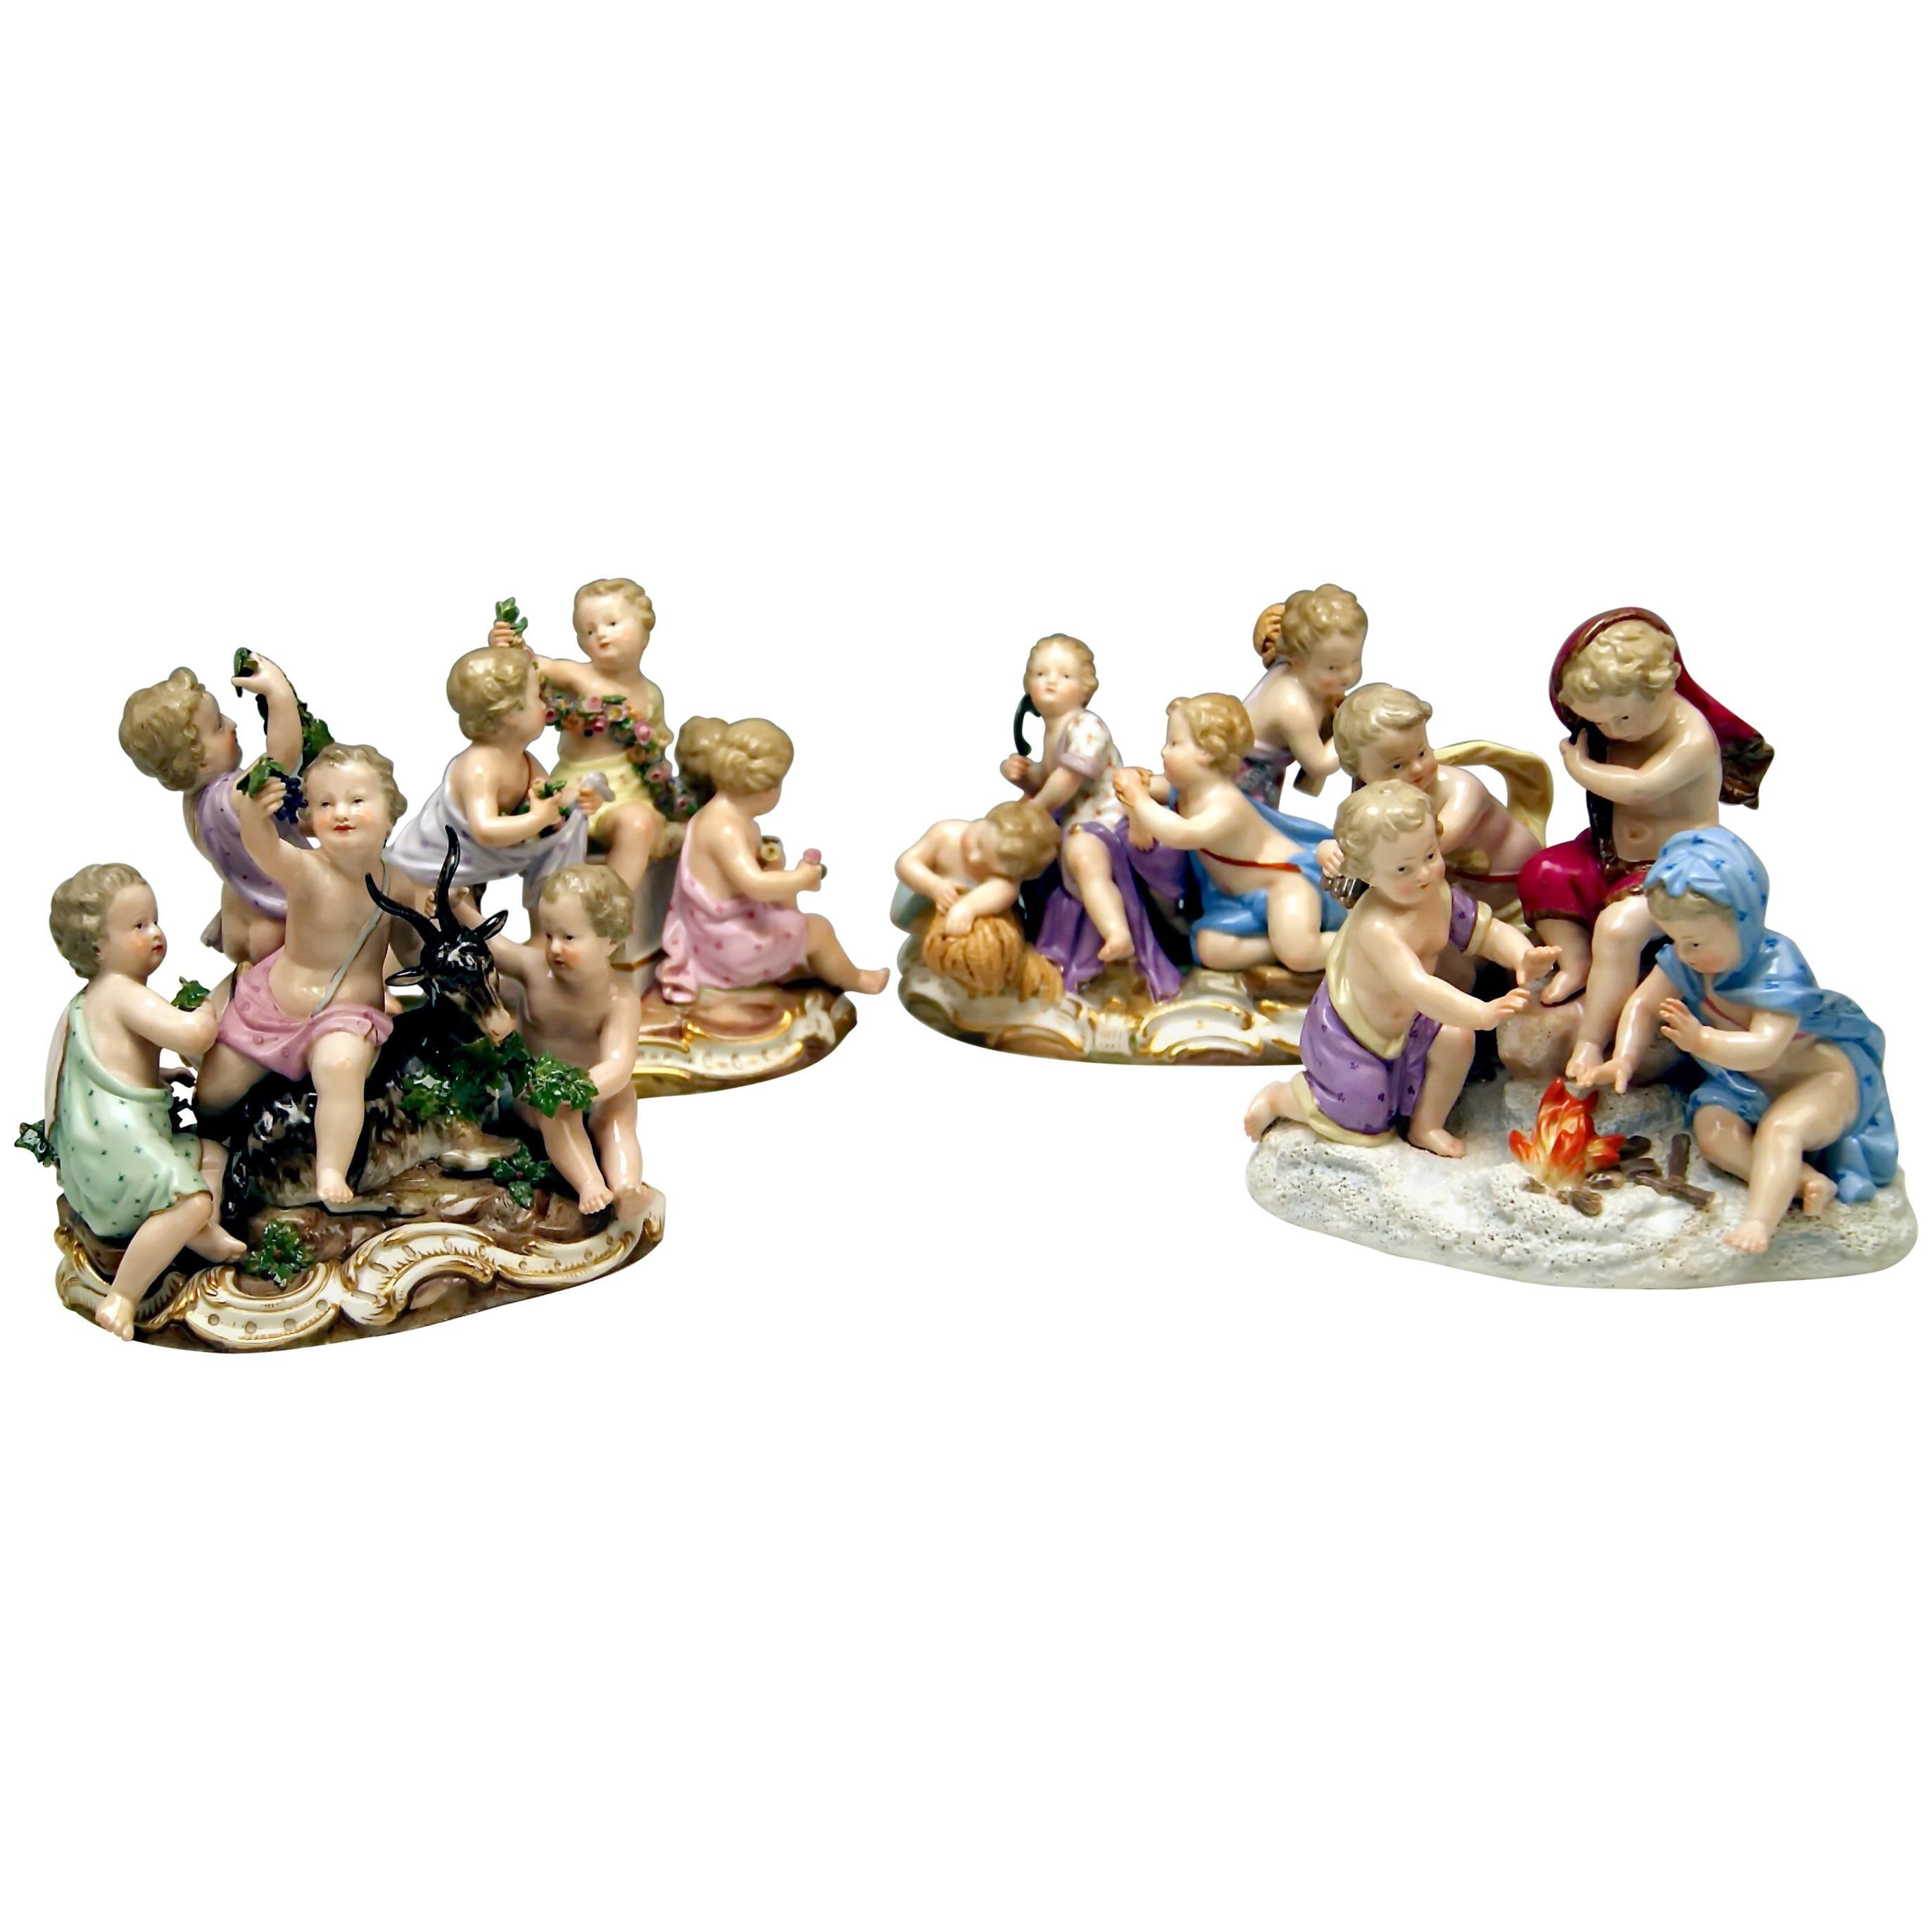 Meissen Four Seasons Figurines by Kaendler, circa 1850